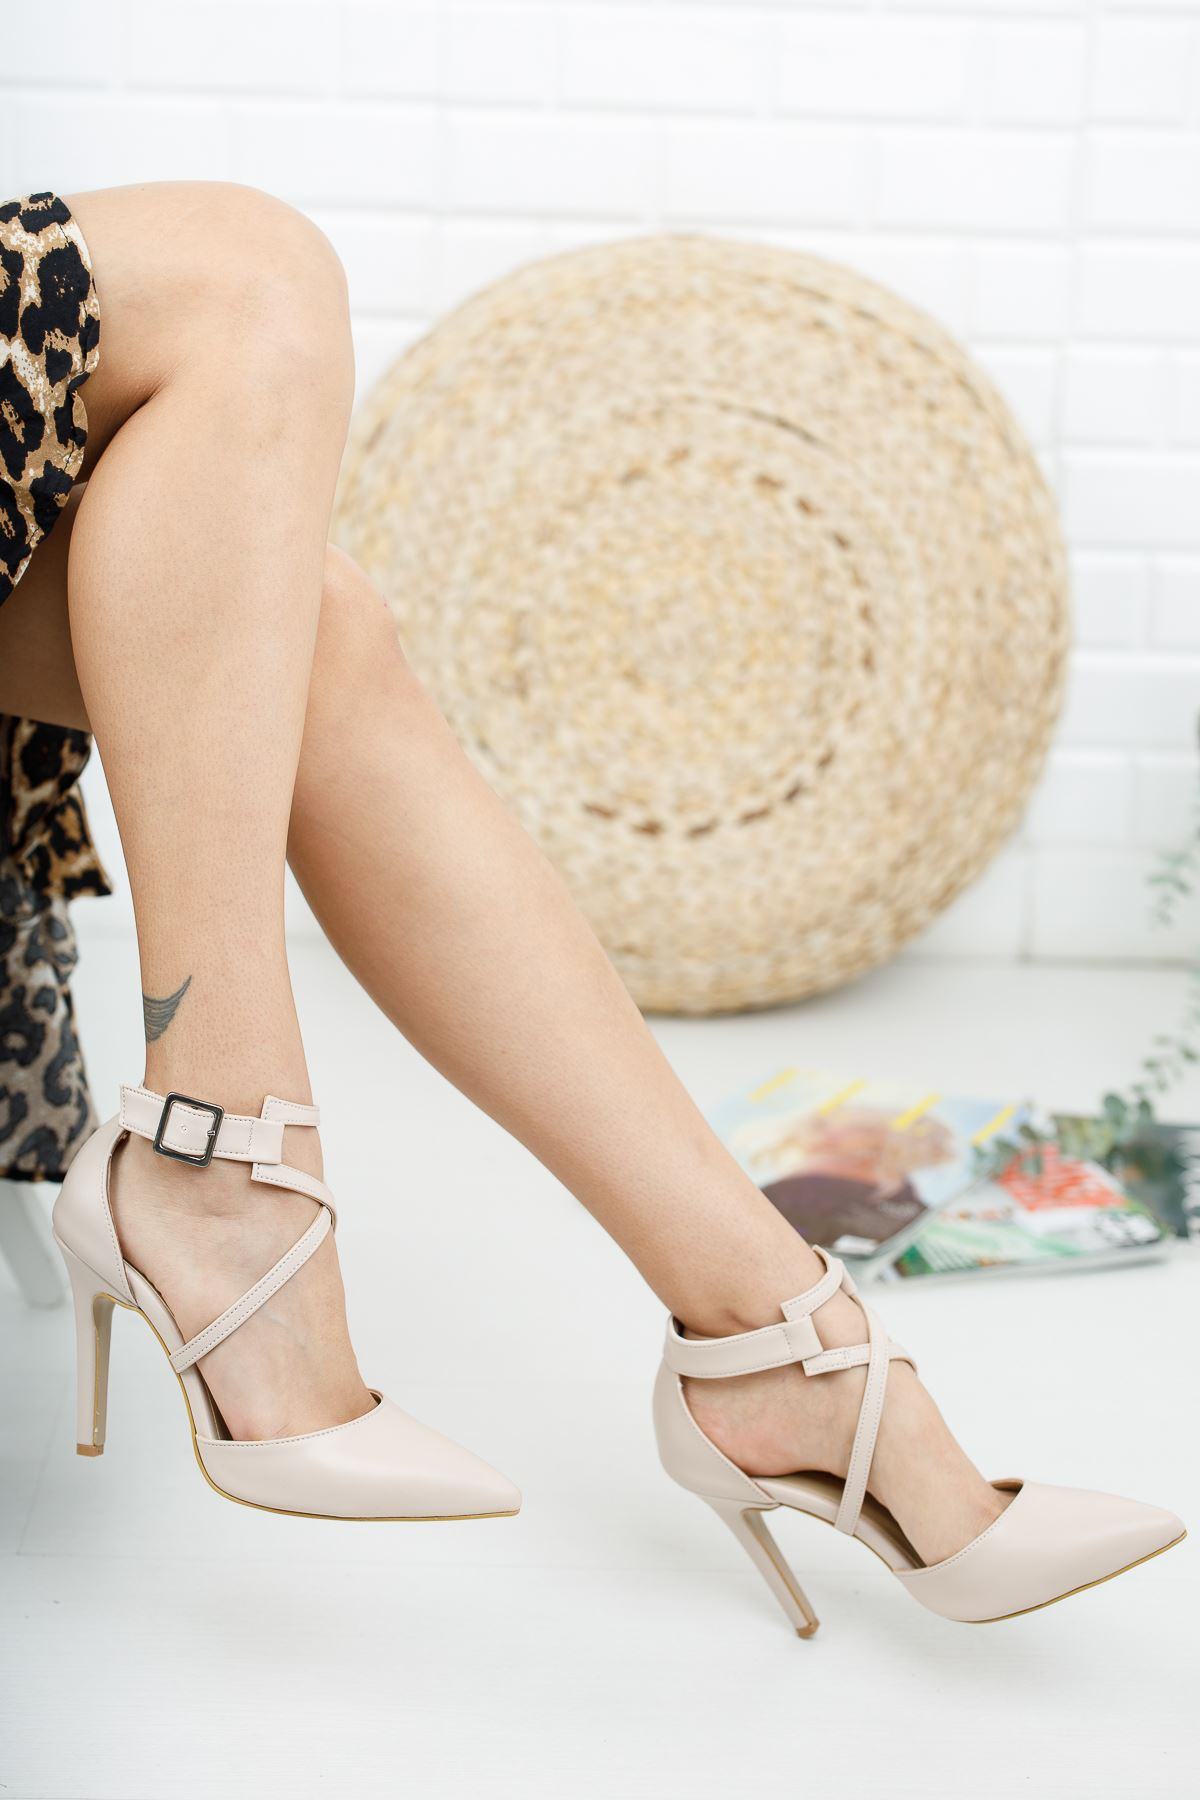 Edrie Ten Cilt Topuklu Ayakkabı Stiletto